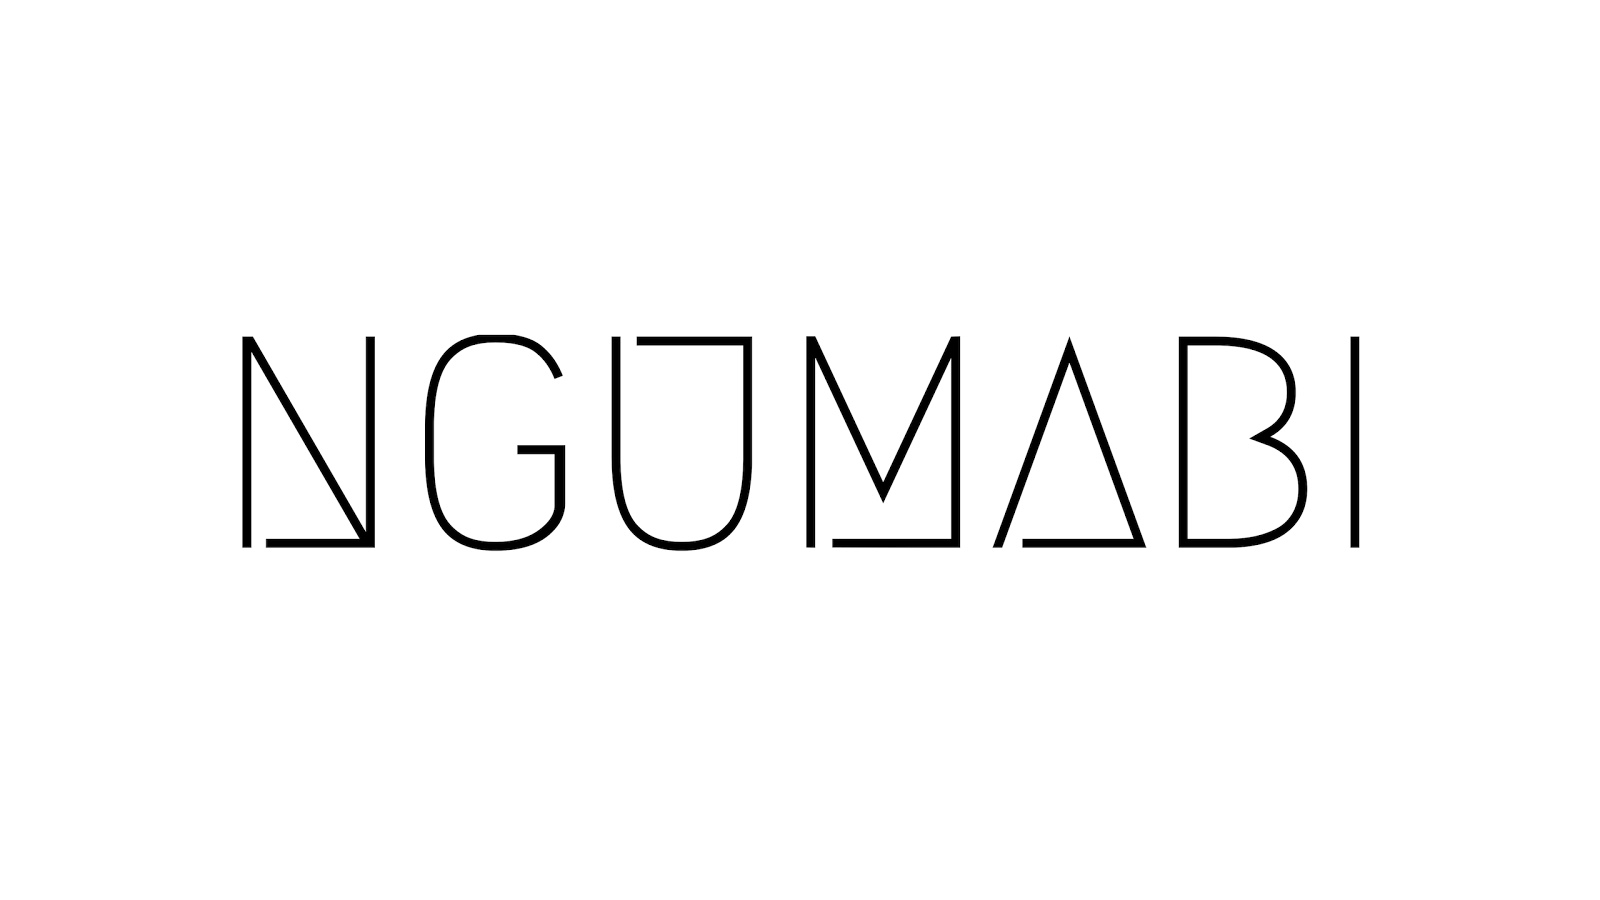 Ngumabi